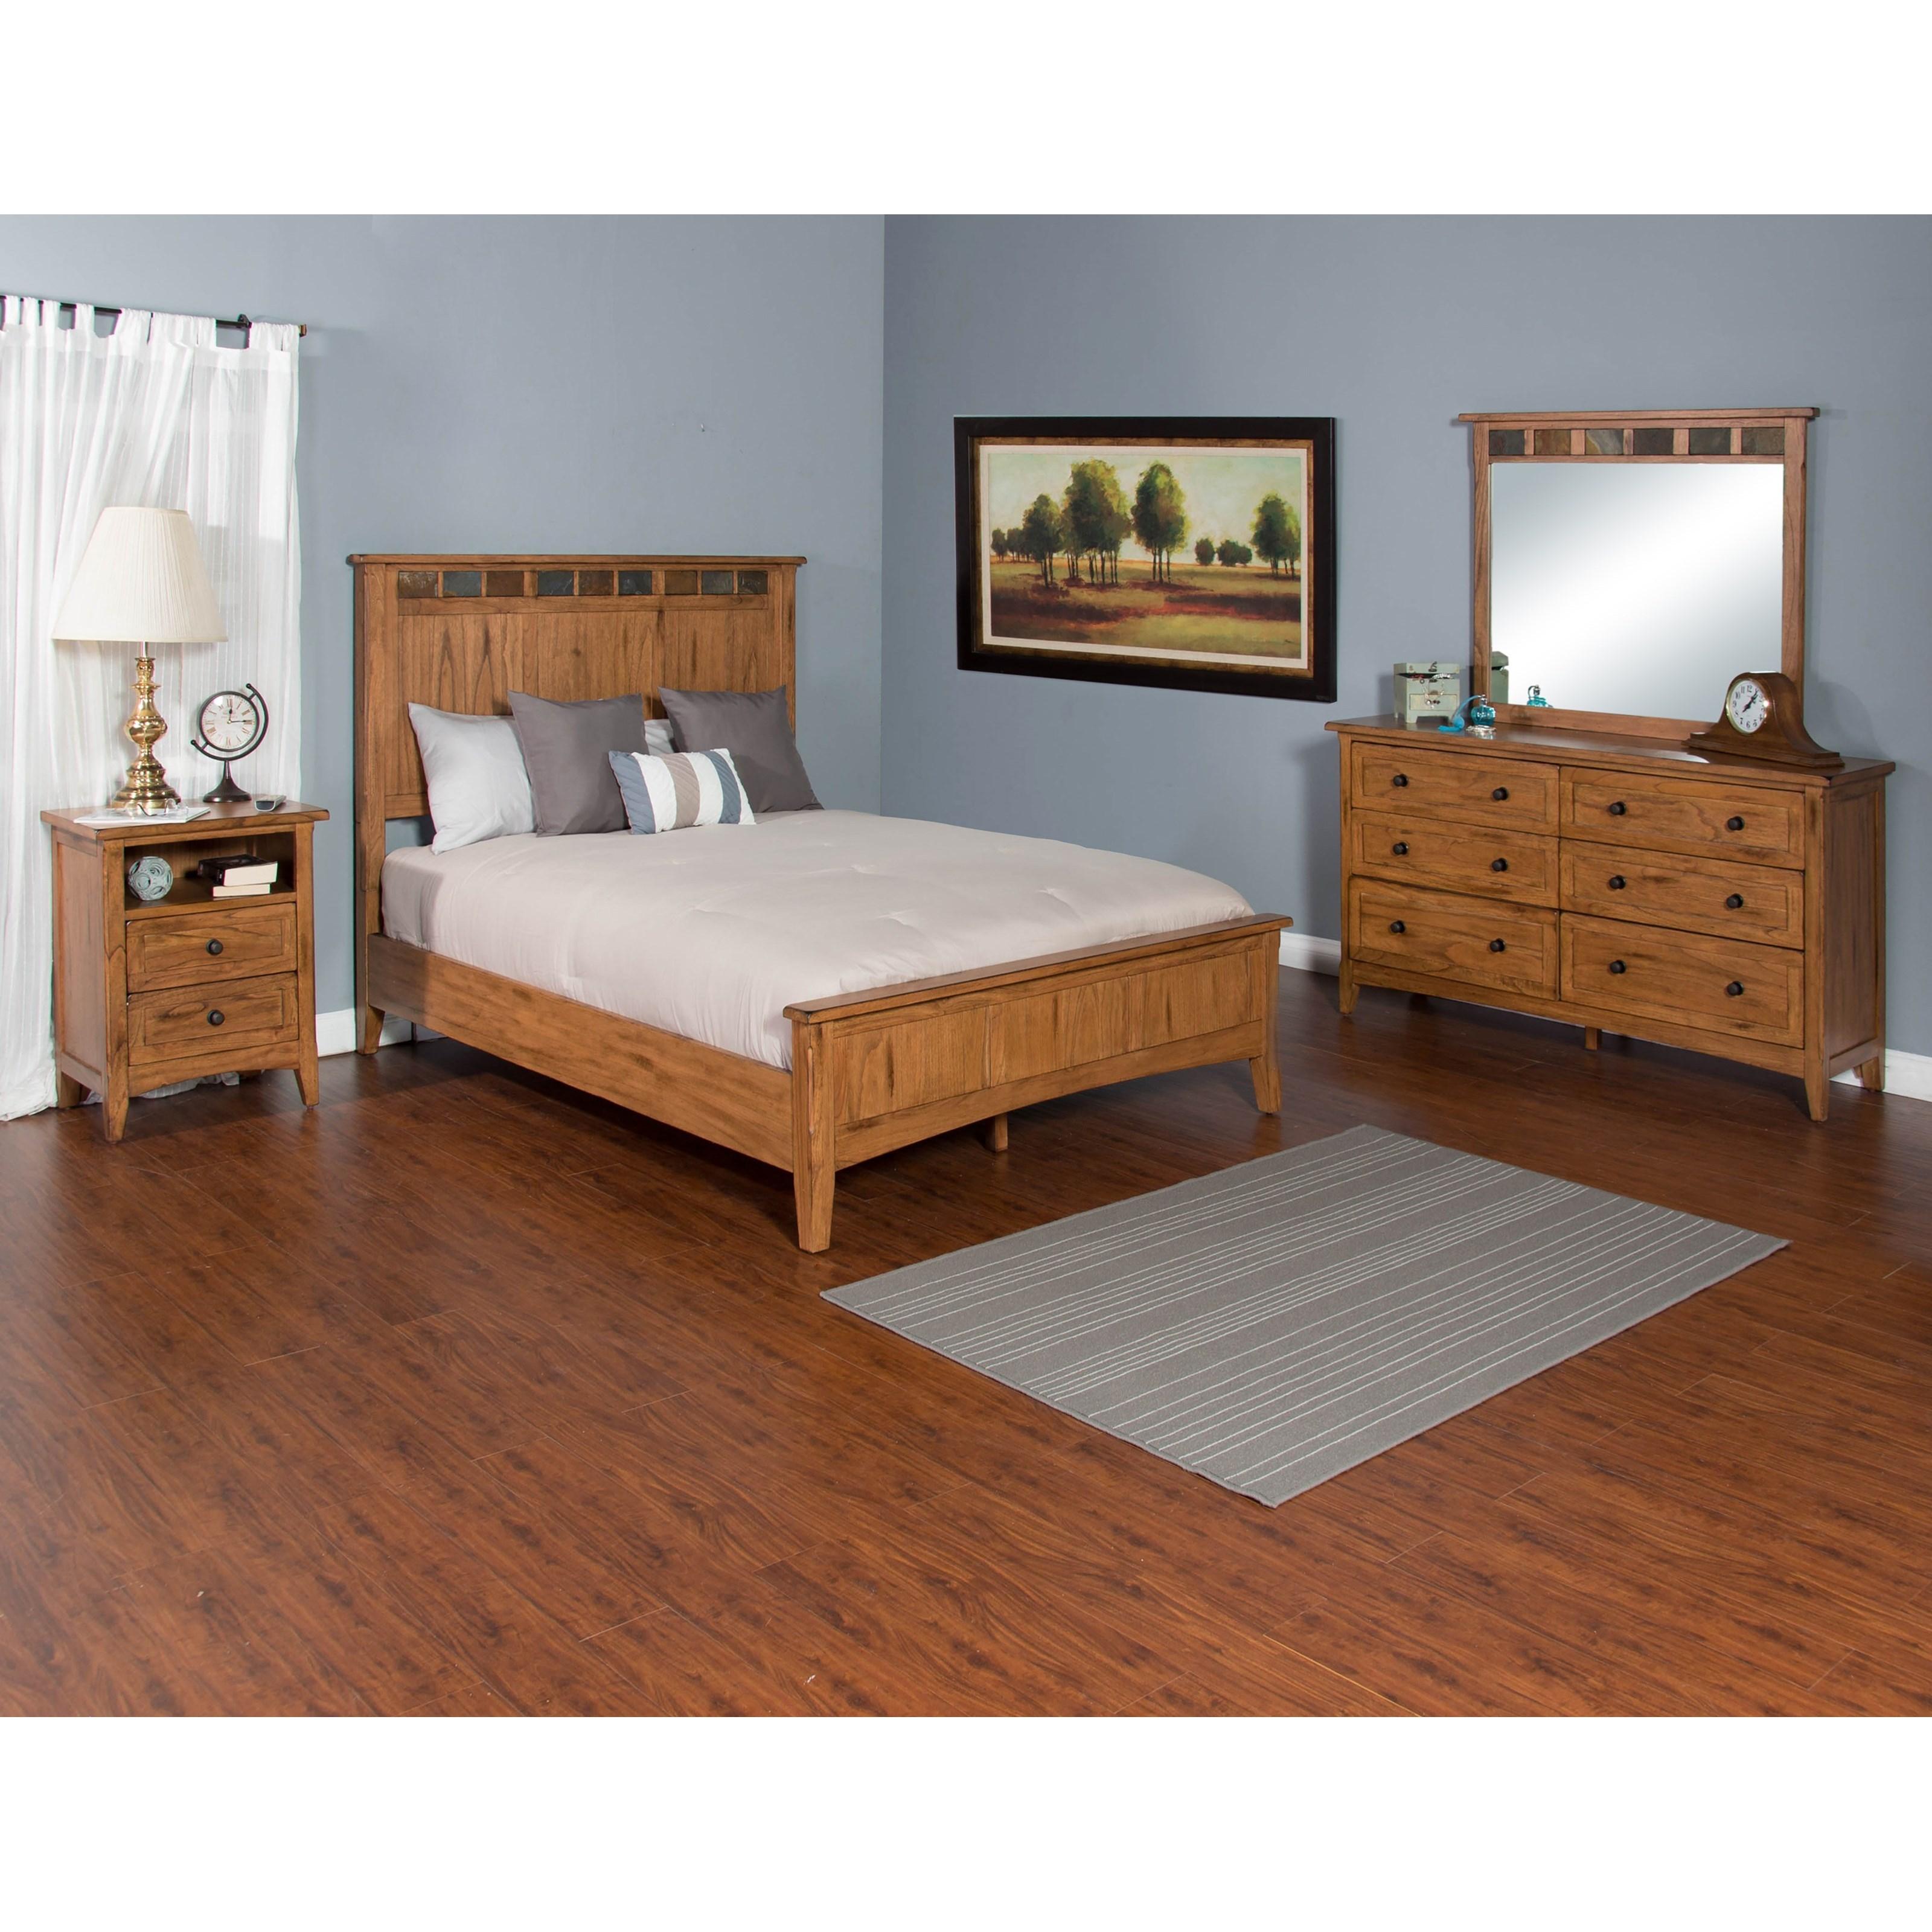 Sunny Designs Sedona Queen Bedroom Group | John V Schultz ...